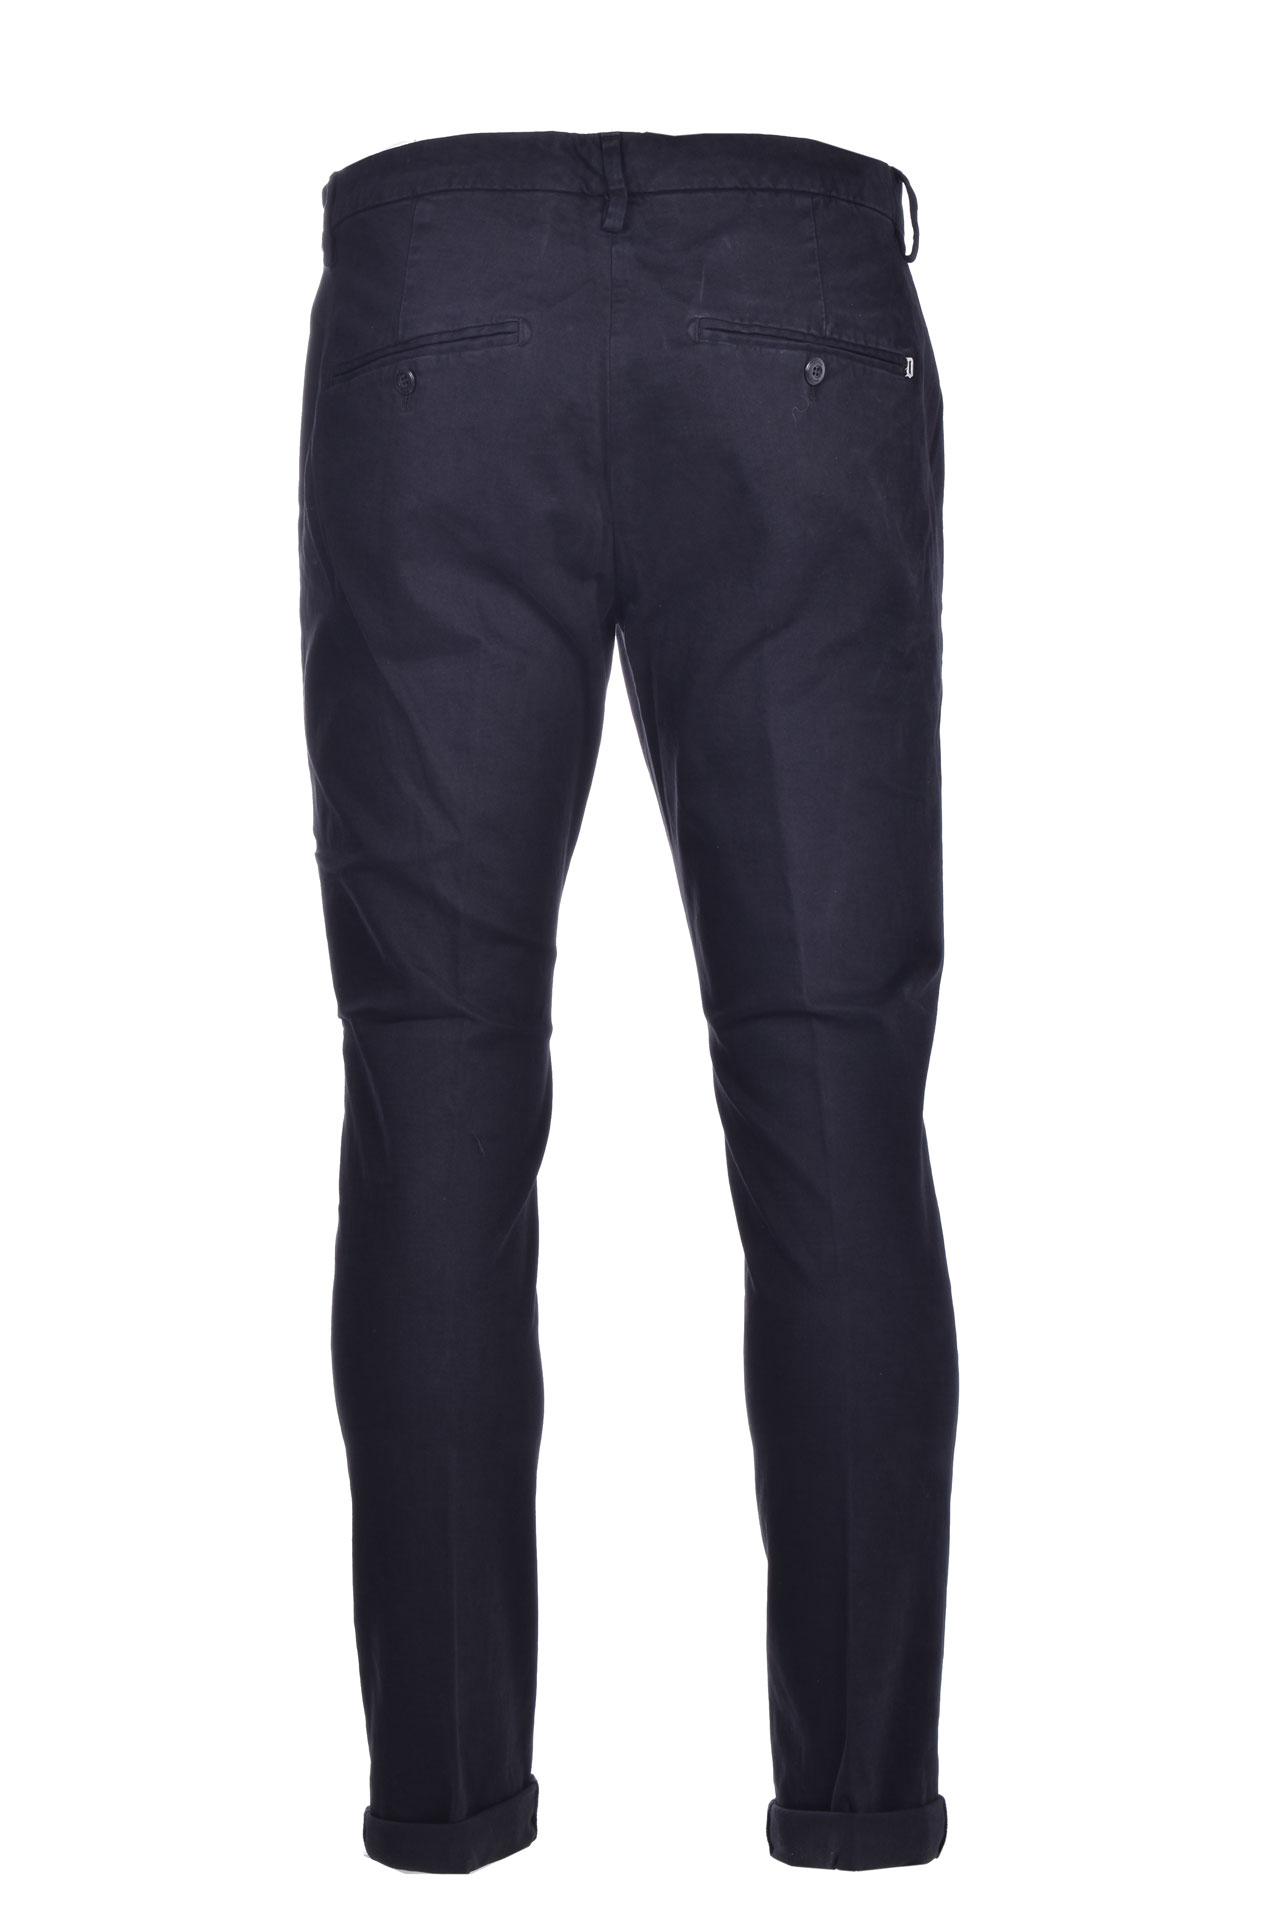 Pantalone chino slim in gabardin DONDUP | Pantaloni | UP235GSE043PTDDU999U